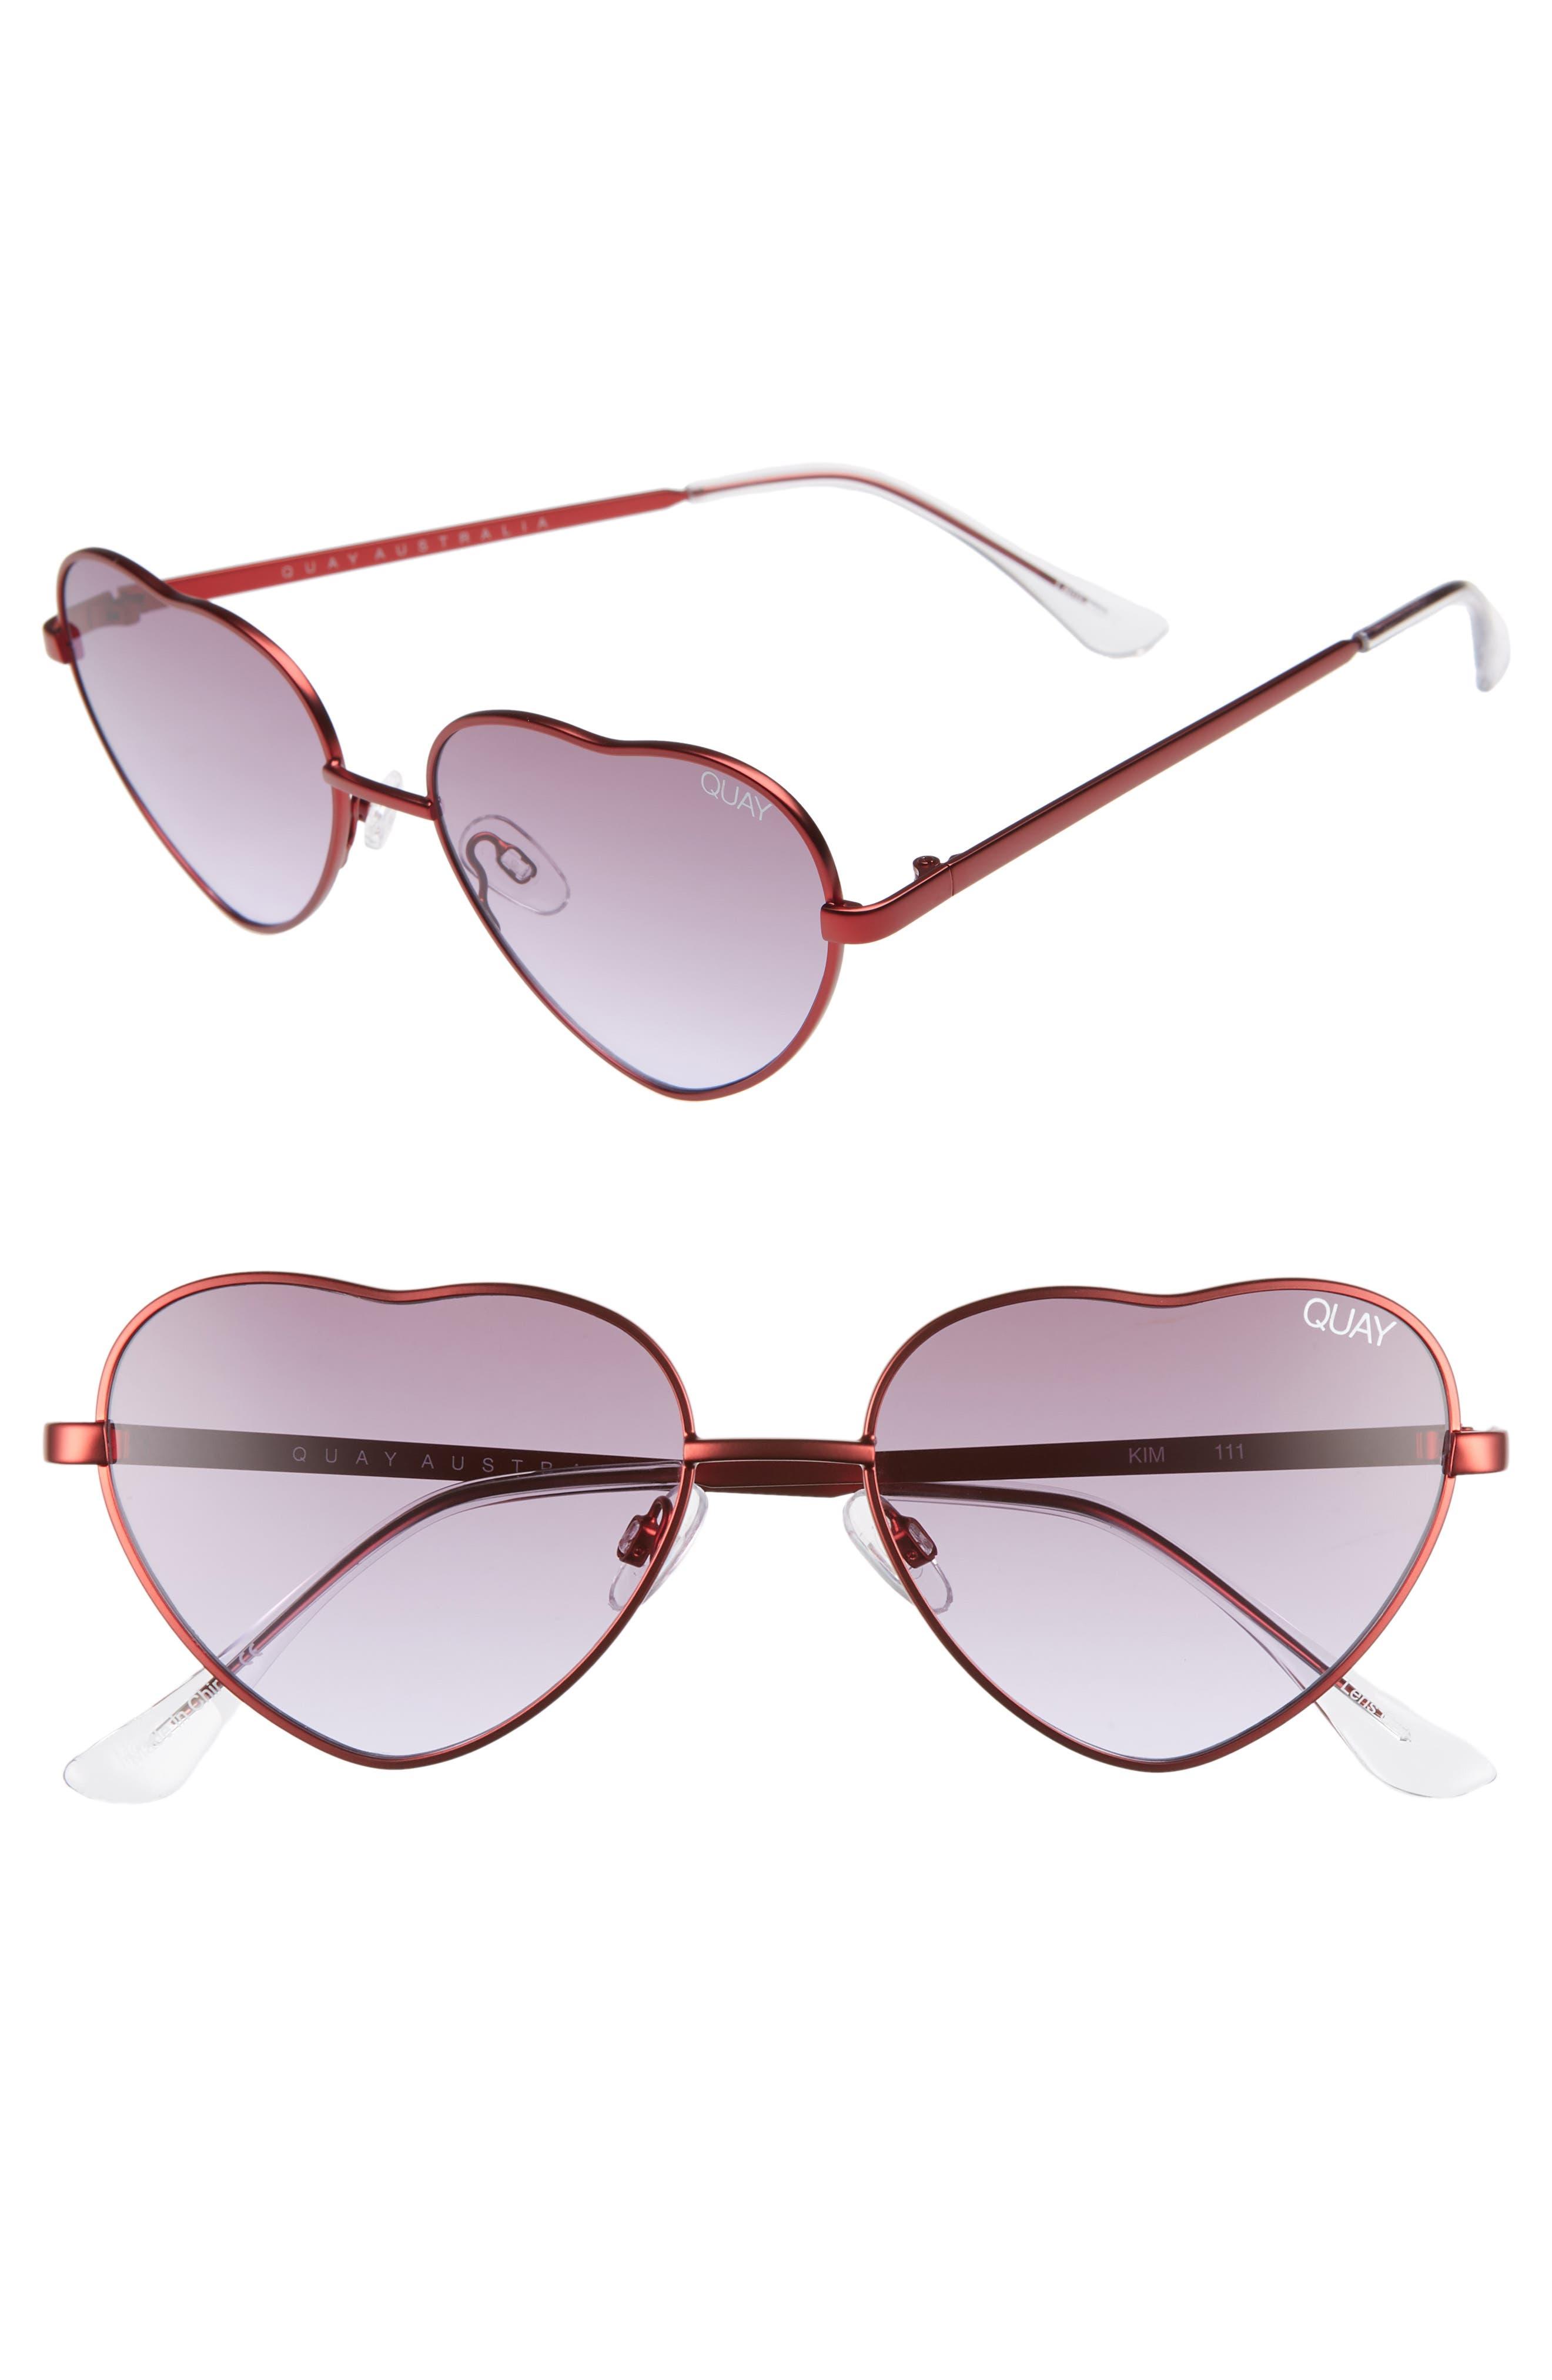 x Elle Ferguson Kim 55mm Heart Sunglasses,                             Main thumbnail 1, color,                             RED/ PURPLE FADE